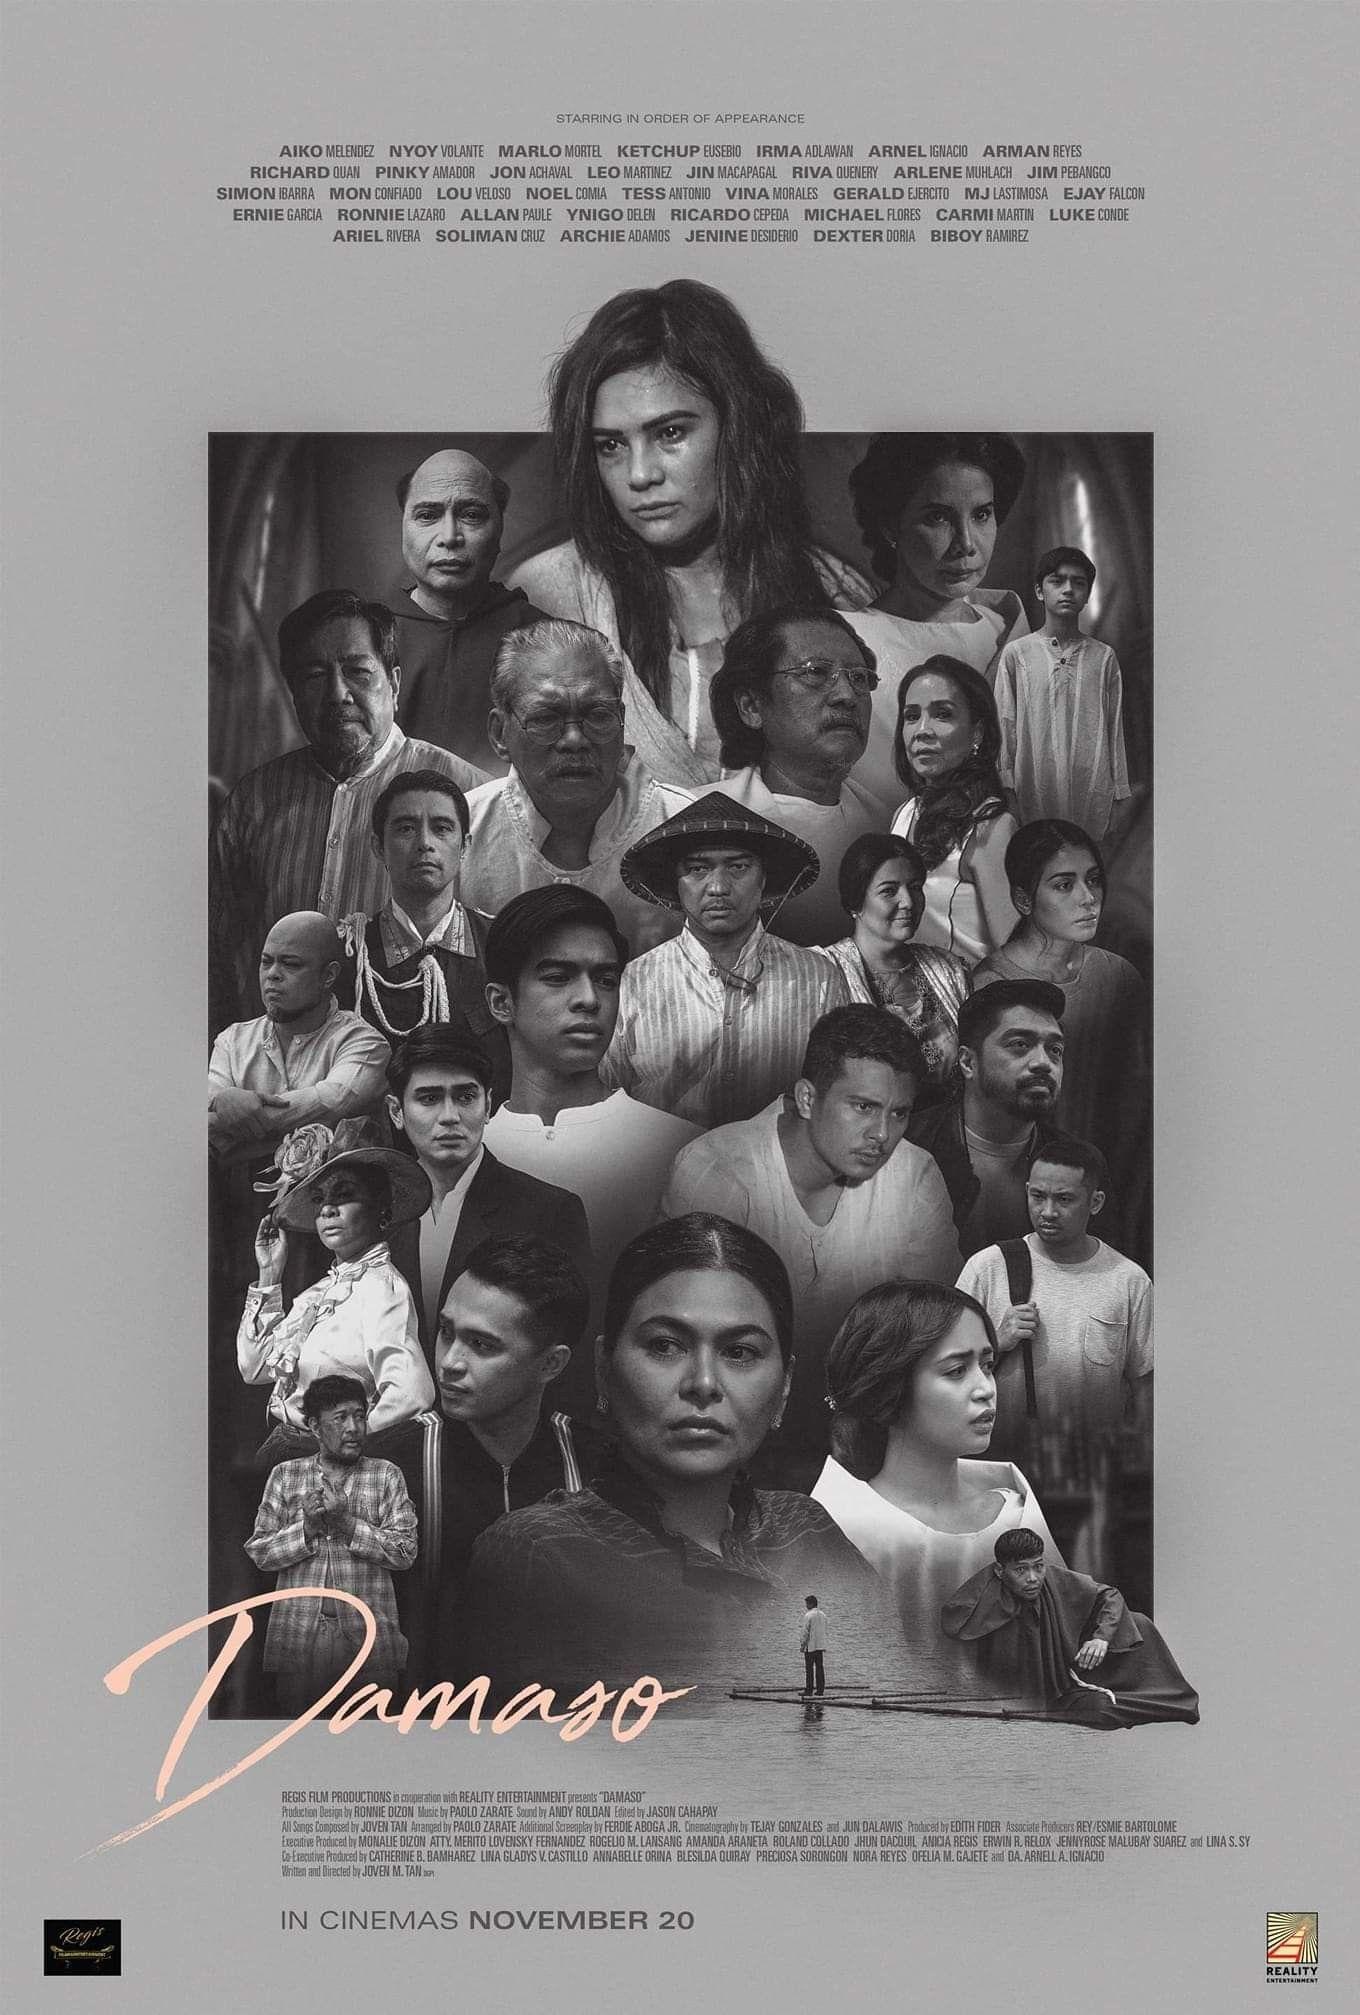 Pin By Nikki Santos Ocampo On Philippine Art Full Movies Free Movies Online Full Movies Online Free